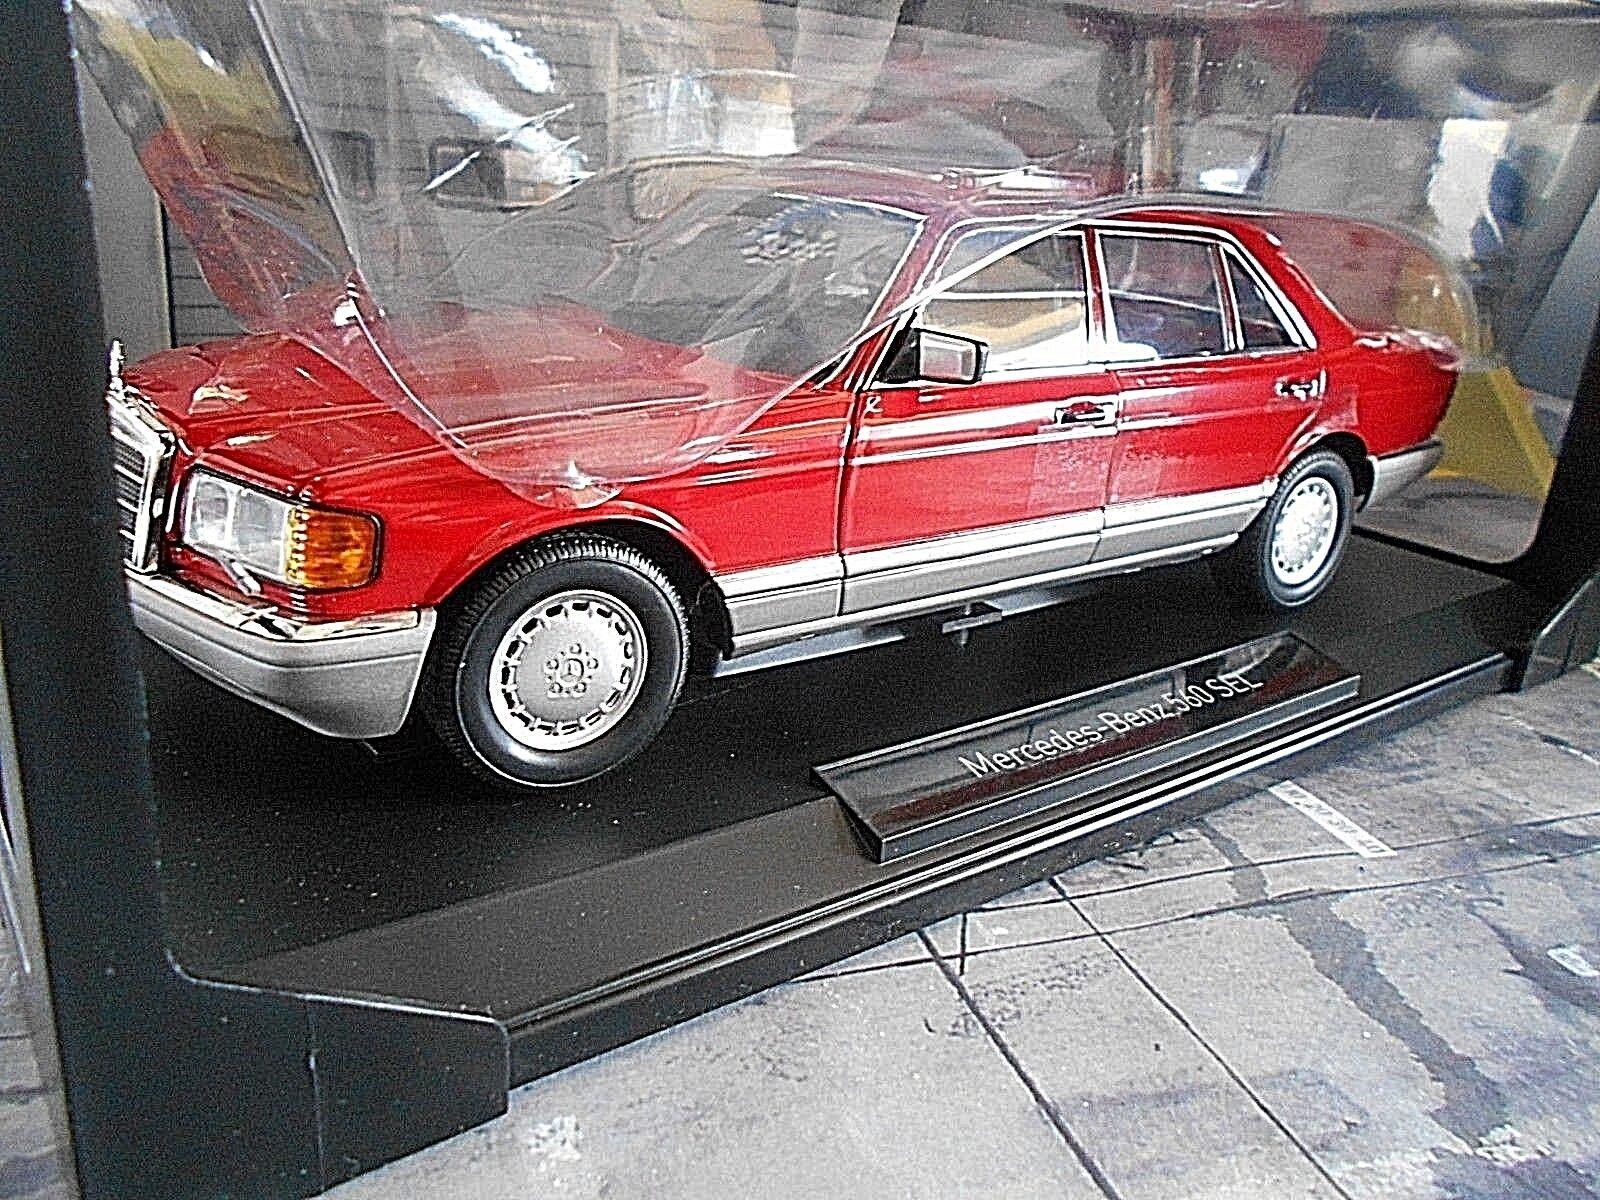 MERCEDES BENZ S-Klasse W126 rot rot 560 SEL 1991 Norev limited 1 18 RAR